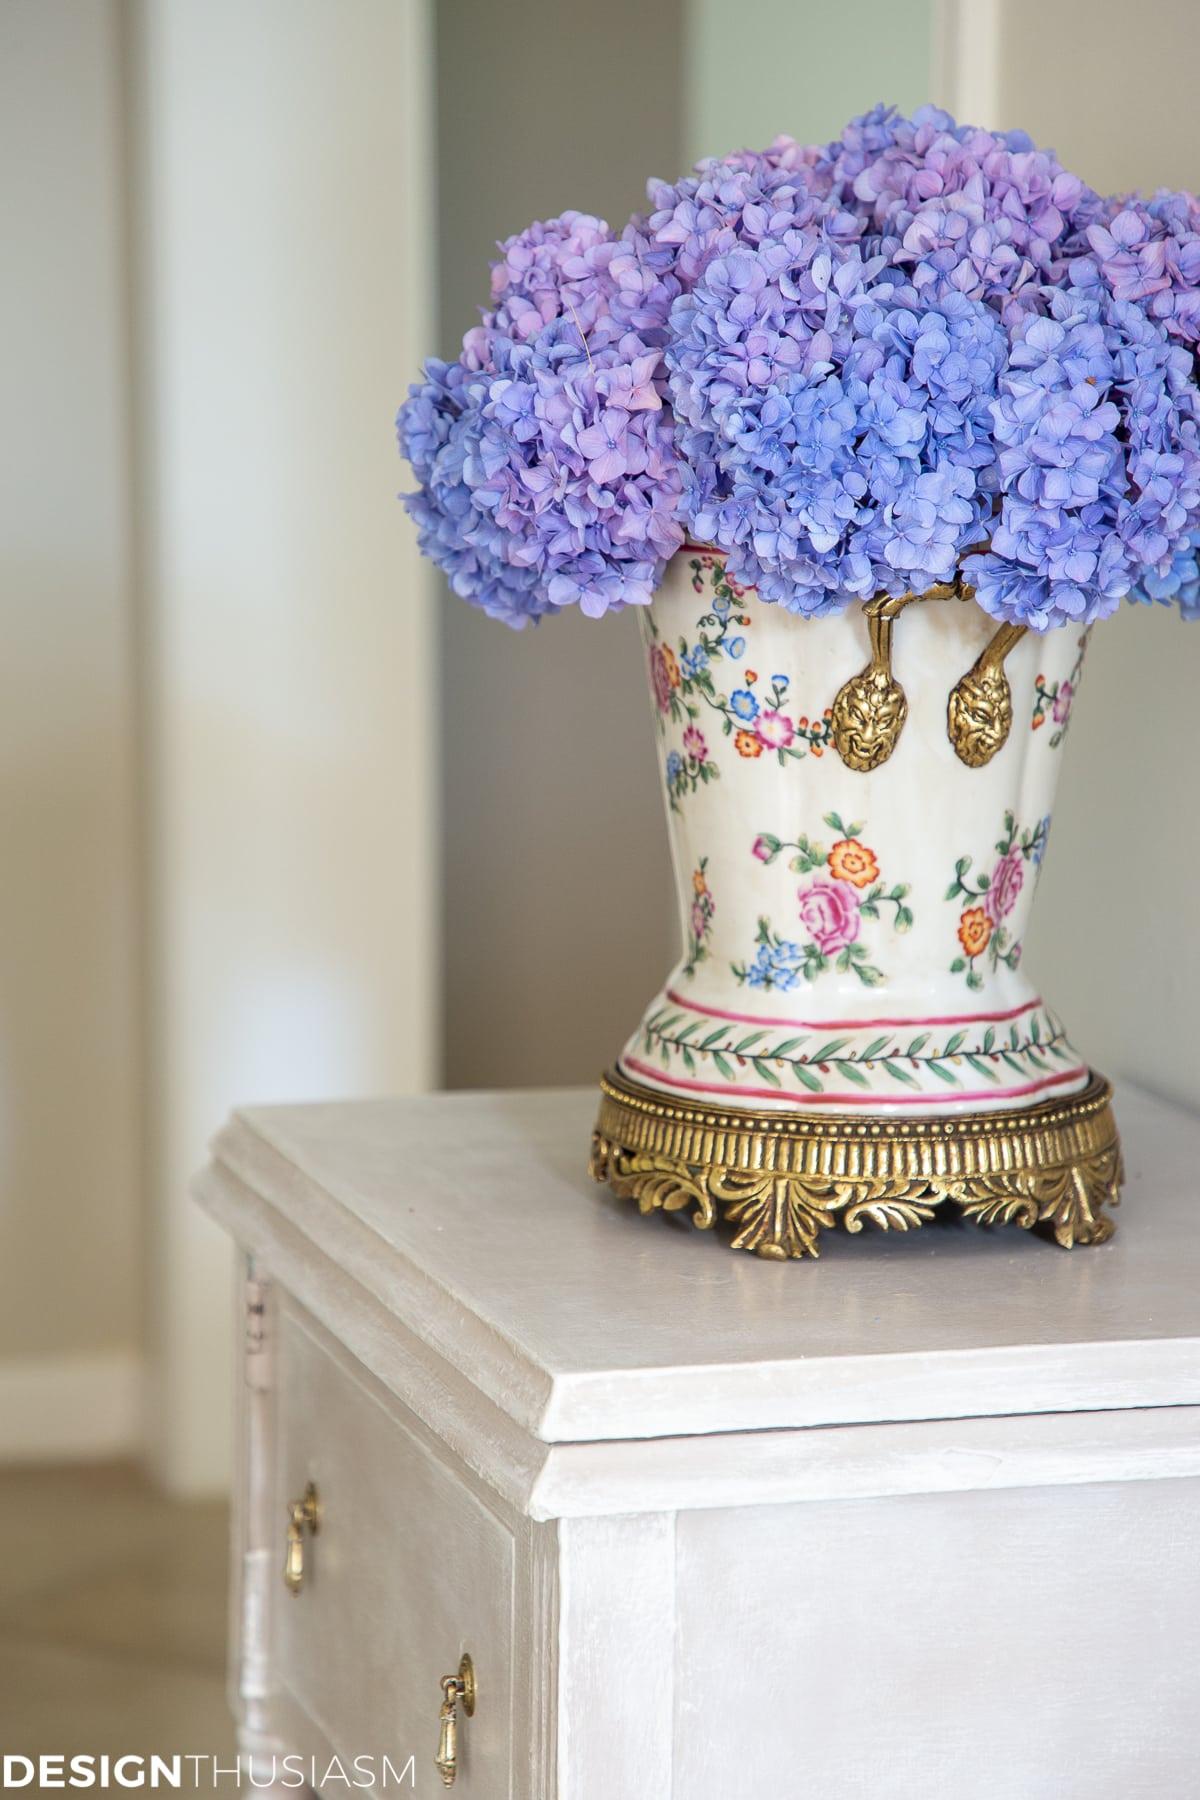 hydrangeas in a vase floral arrangement